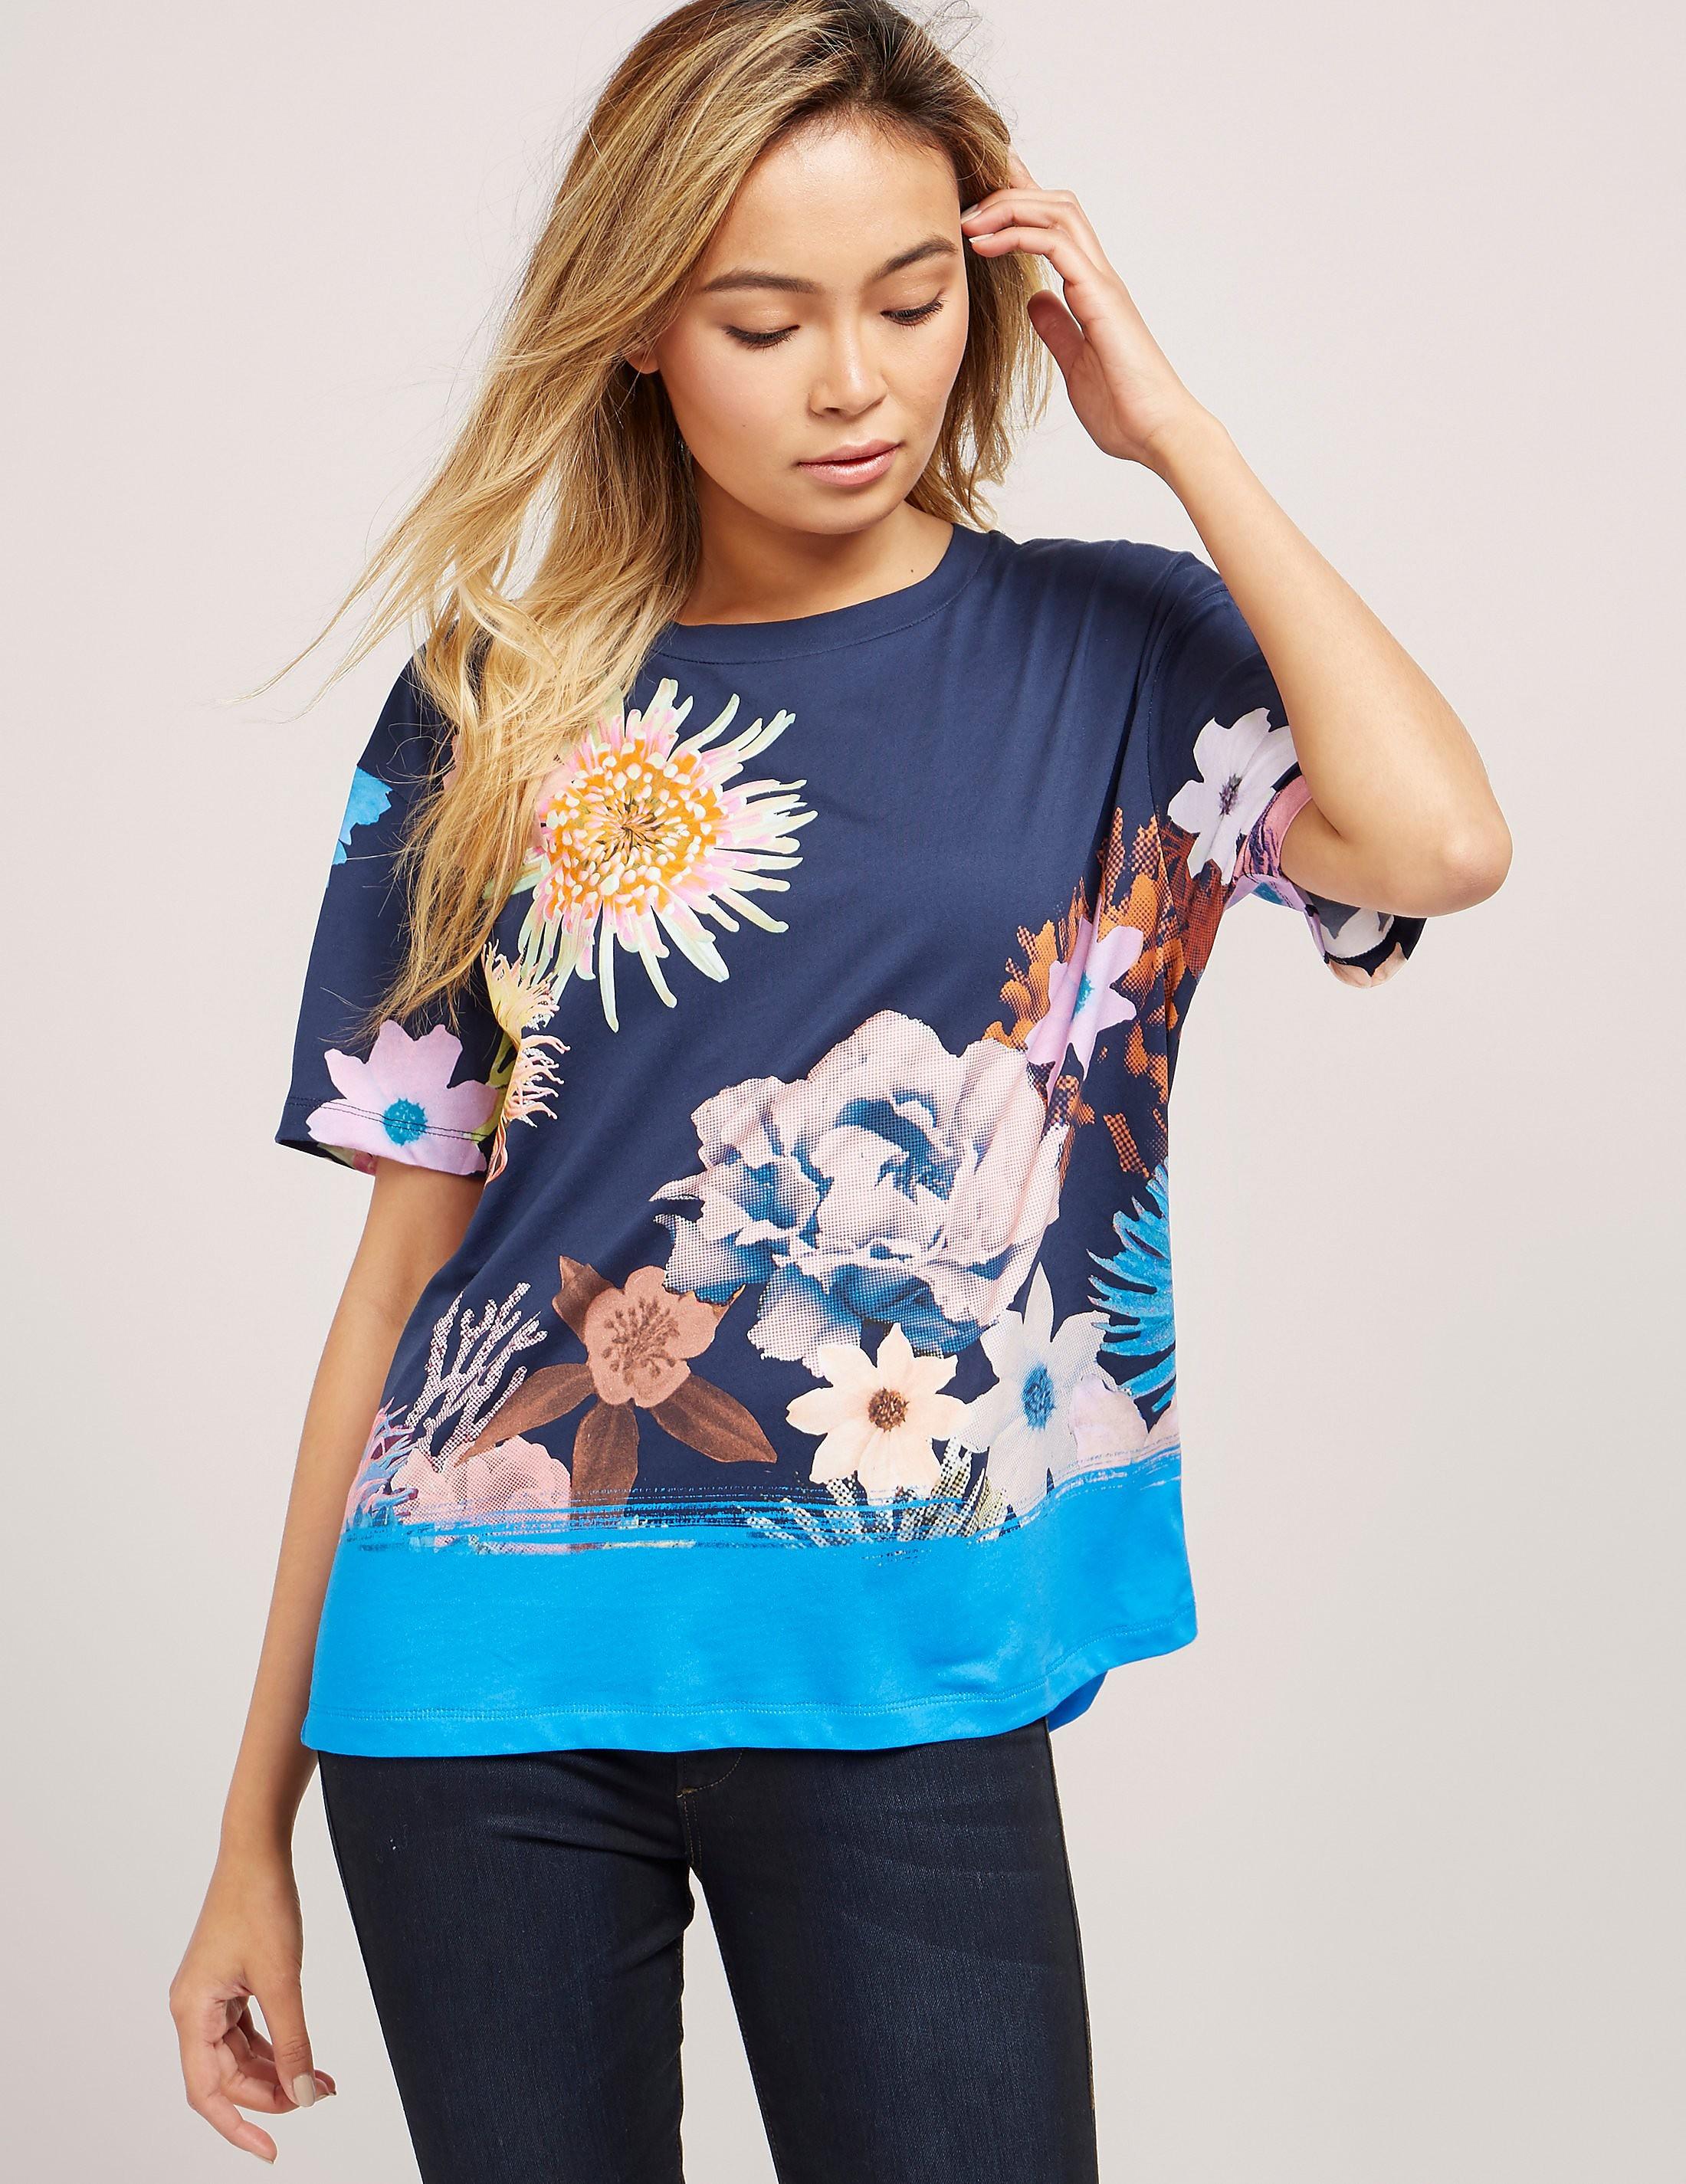 Paul Smith Ocean Floral Print T-Shirt